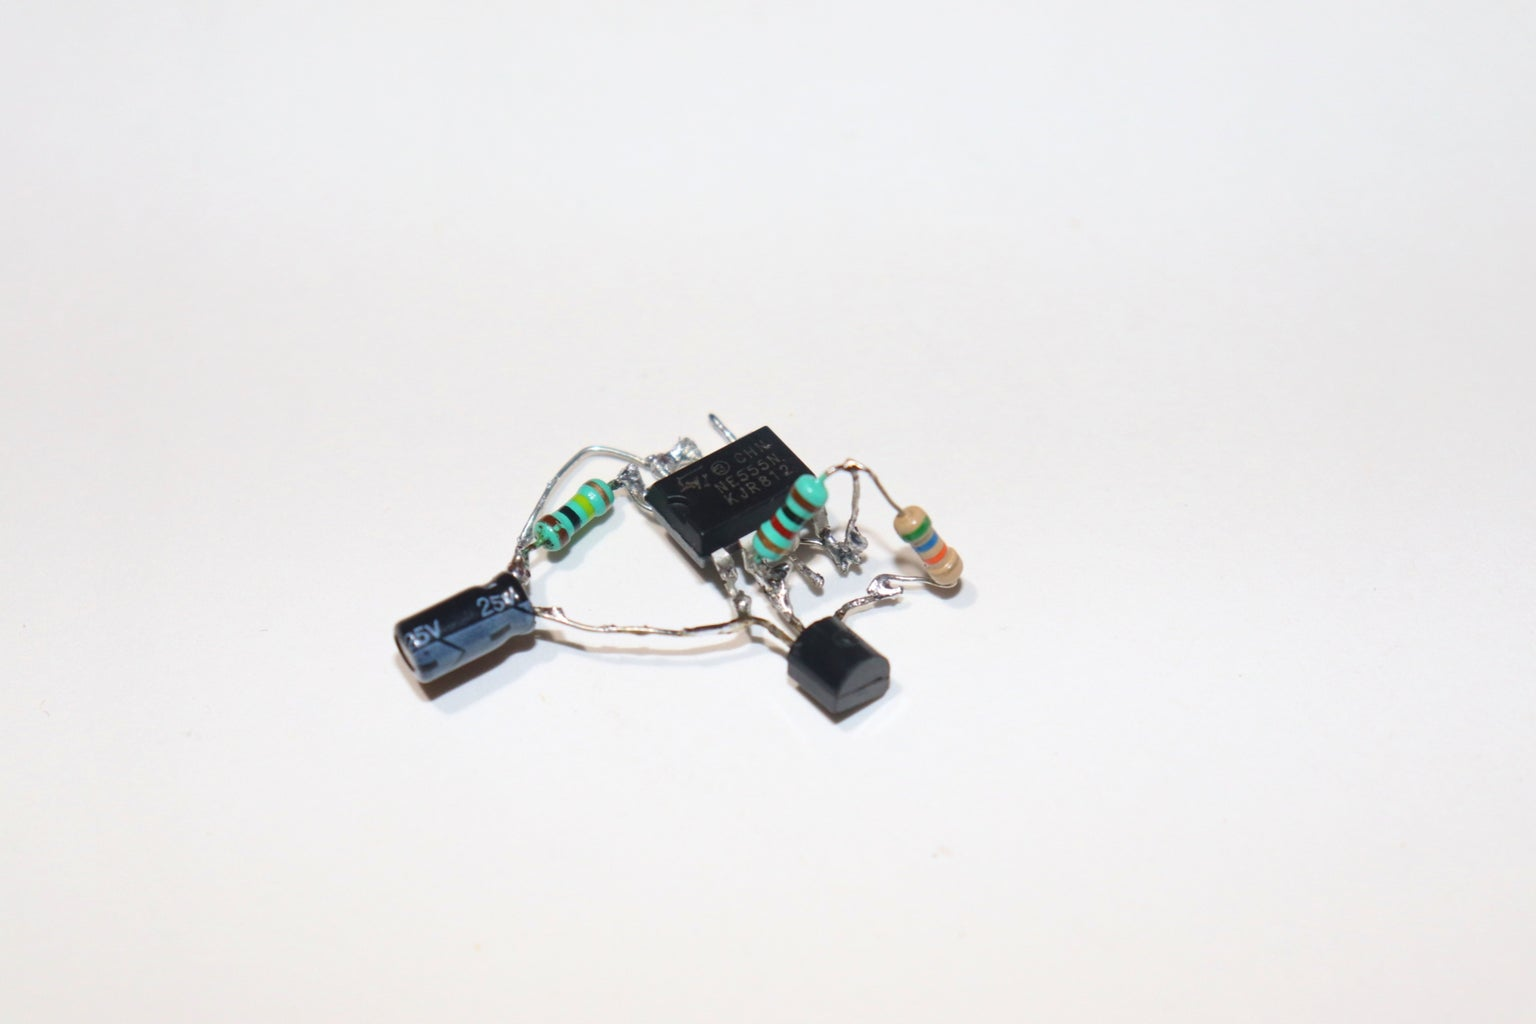 Connect 56K Resistor